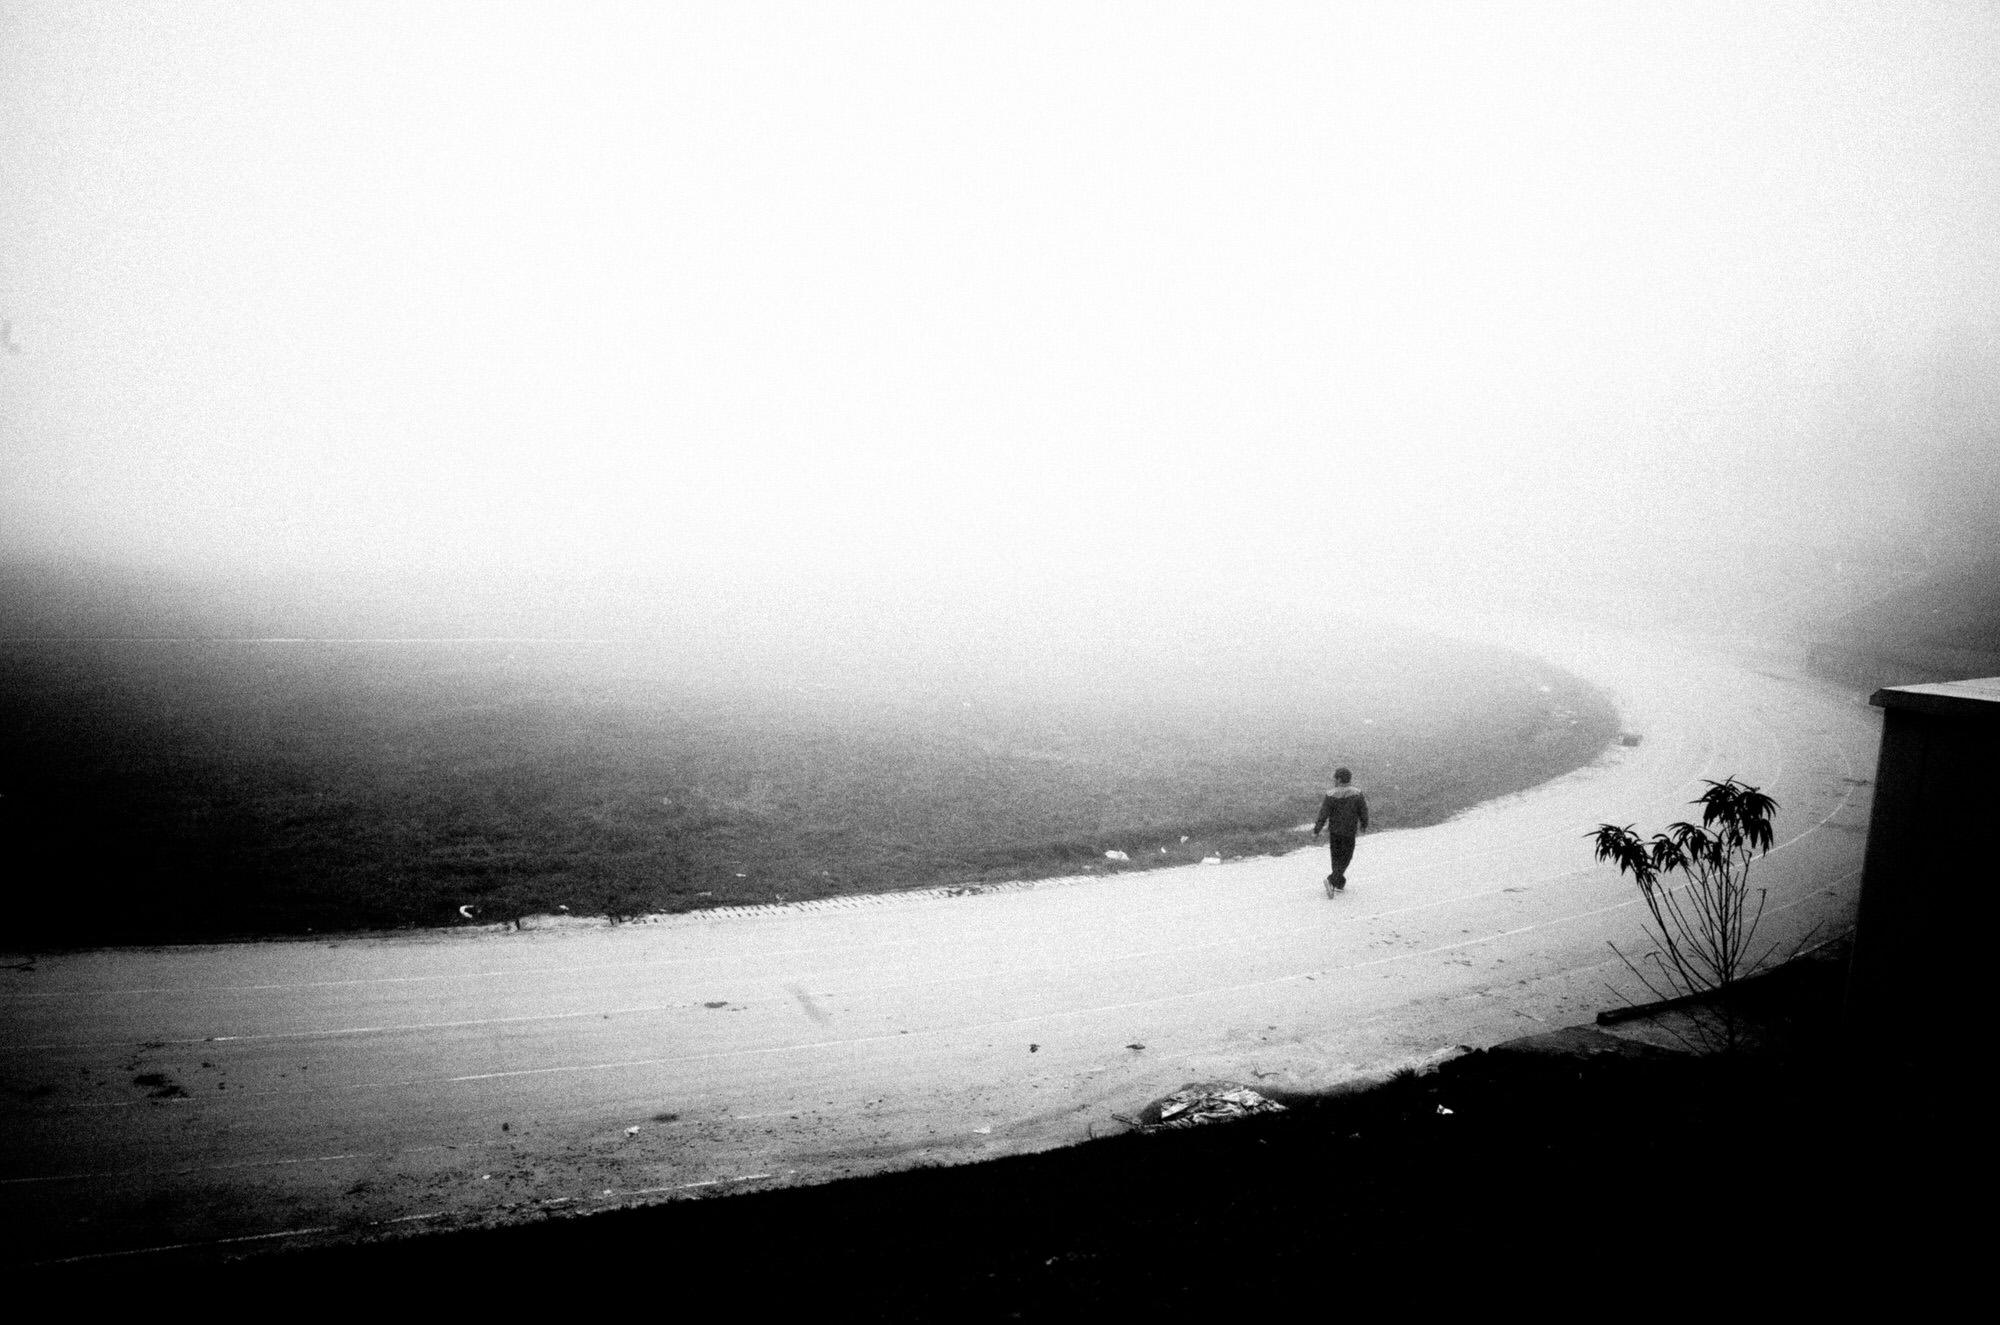 ERIC KIM STREET PHOTOGRAPHY4